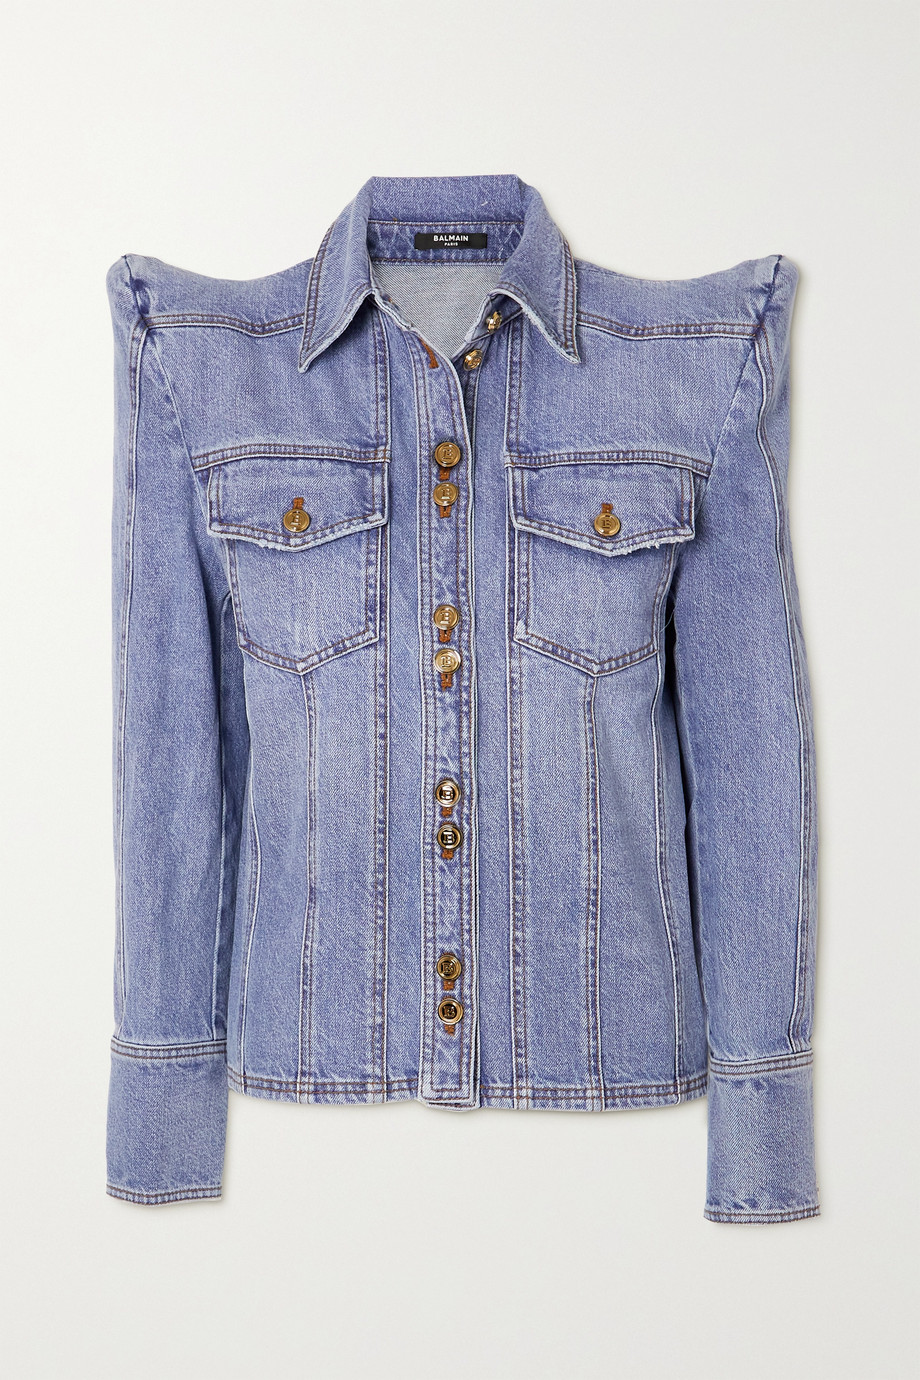 Balmain Button-embellished denim shirt